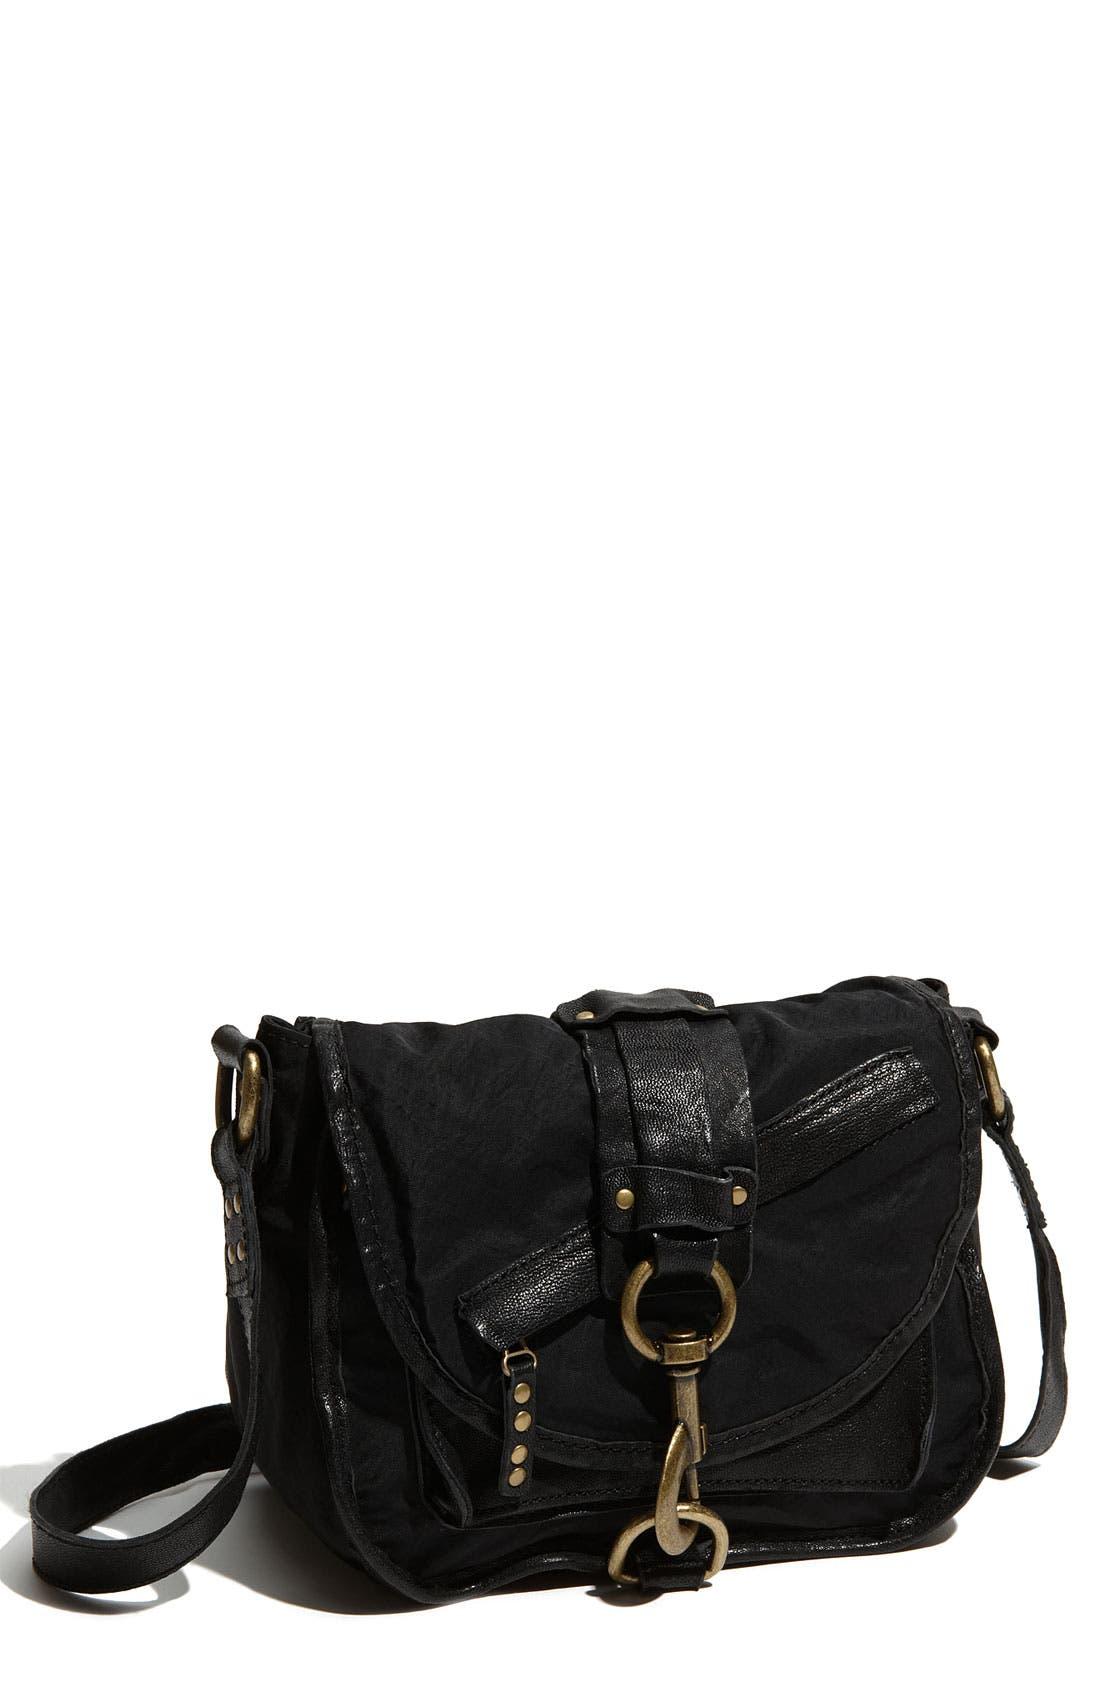 M20 'Marco' Fabric Mini Bag, Main, color, 001